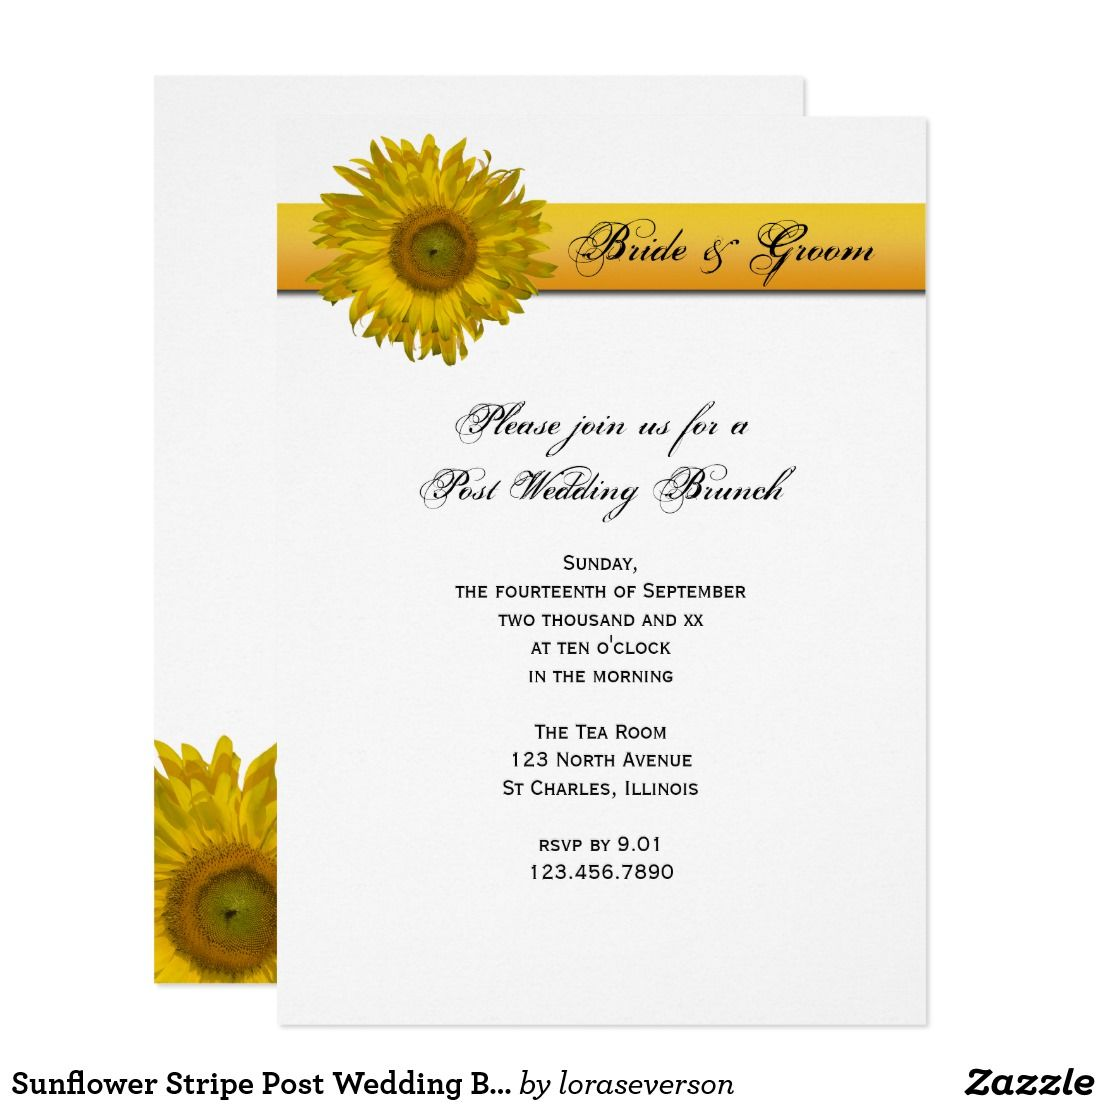 Sunflower Stripe Post Wedding Brunch Invitation | Brunch invitations ...